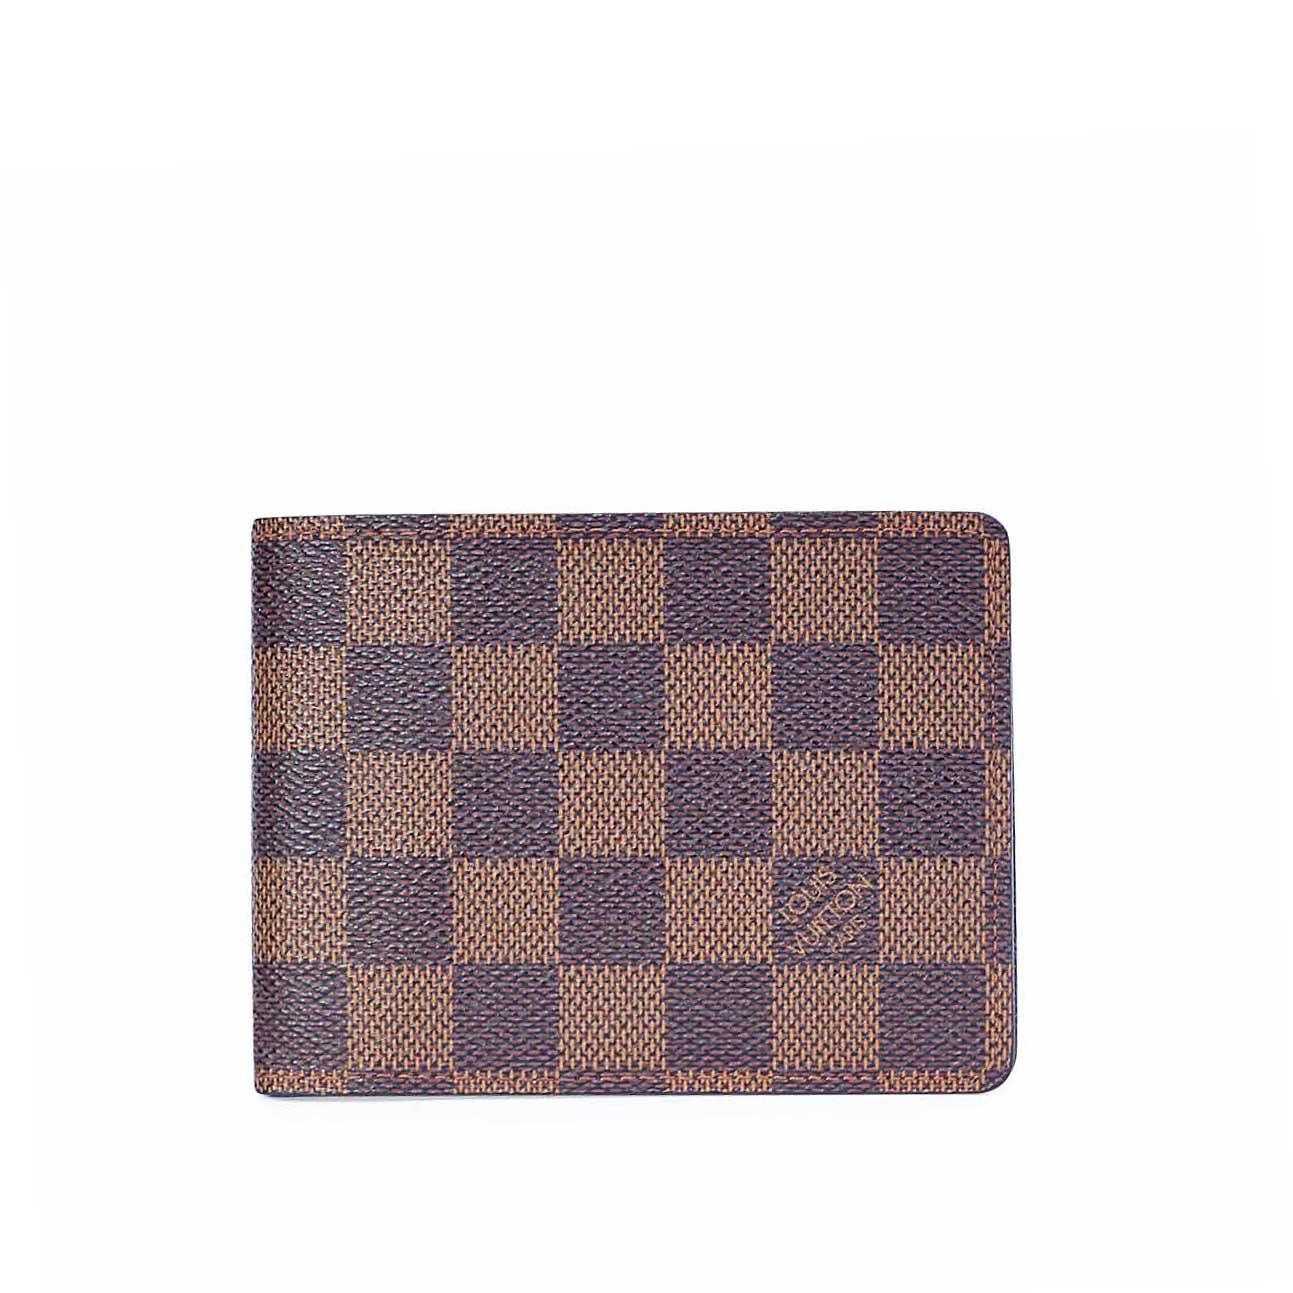 3204a6e80b5 LOUIS VUITTON Damier Ebene Multiple Wallet